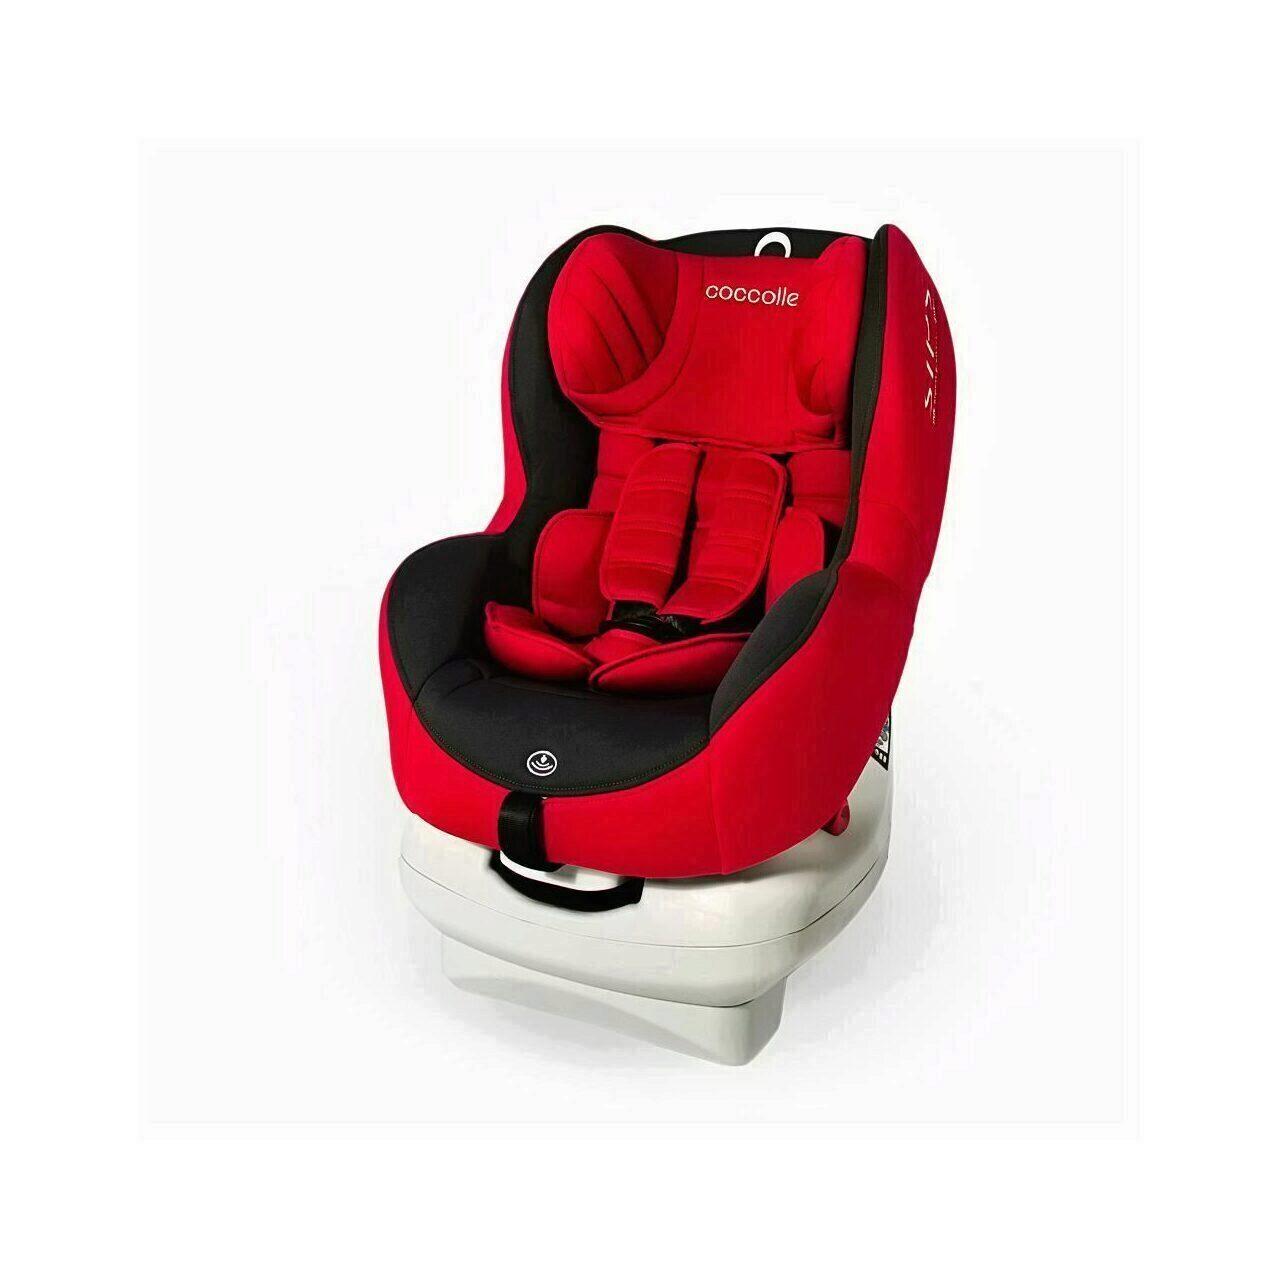 Scaun auto cu Isofix grupa 0-18 kg COCCOLLE Mira-Fix rosu